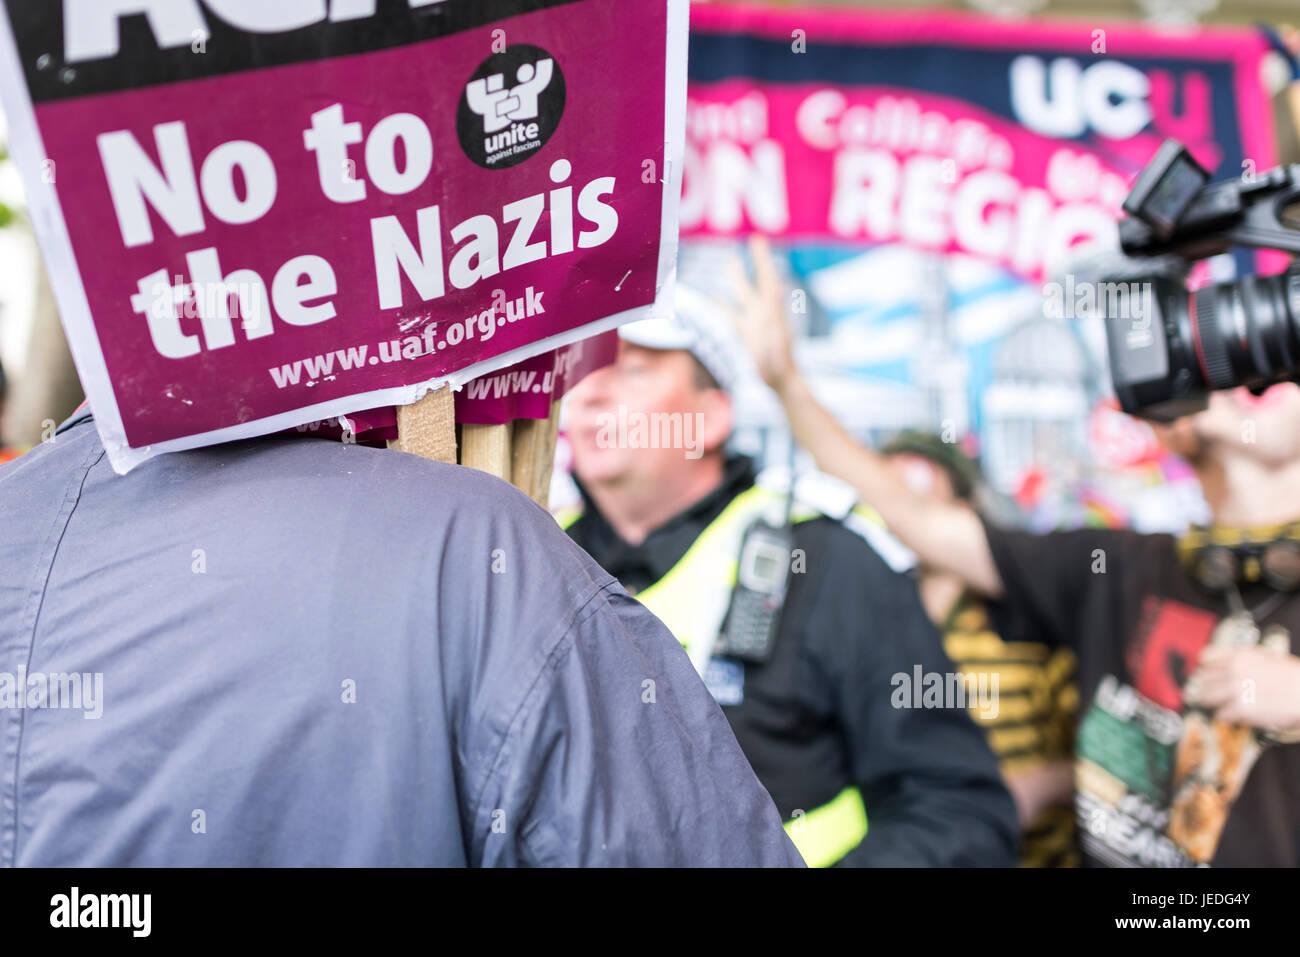 London, UK, 24th June 2017. Unite Against Fascism (UAF) has organized a demonstration near Trafalgar Square against - Stock Image